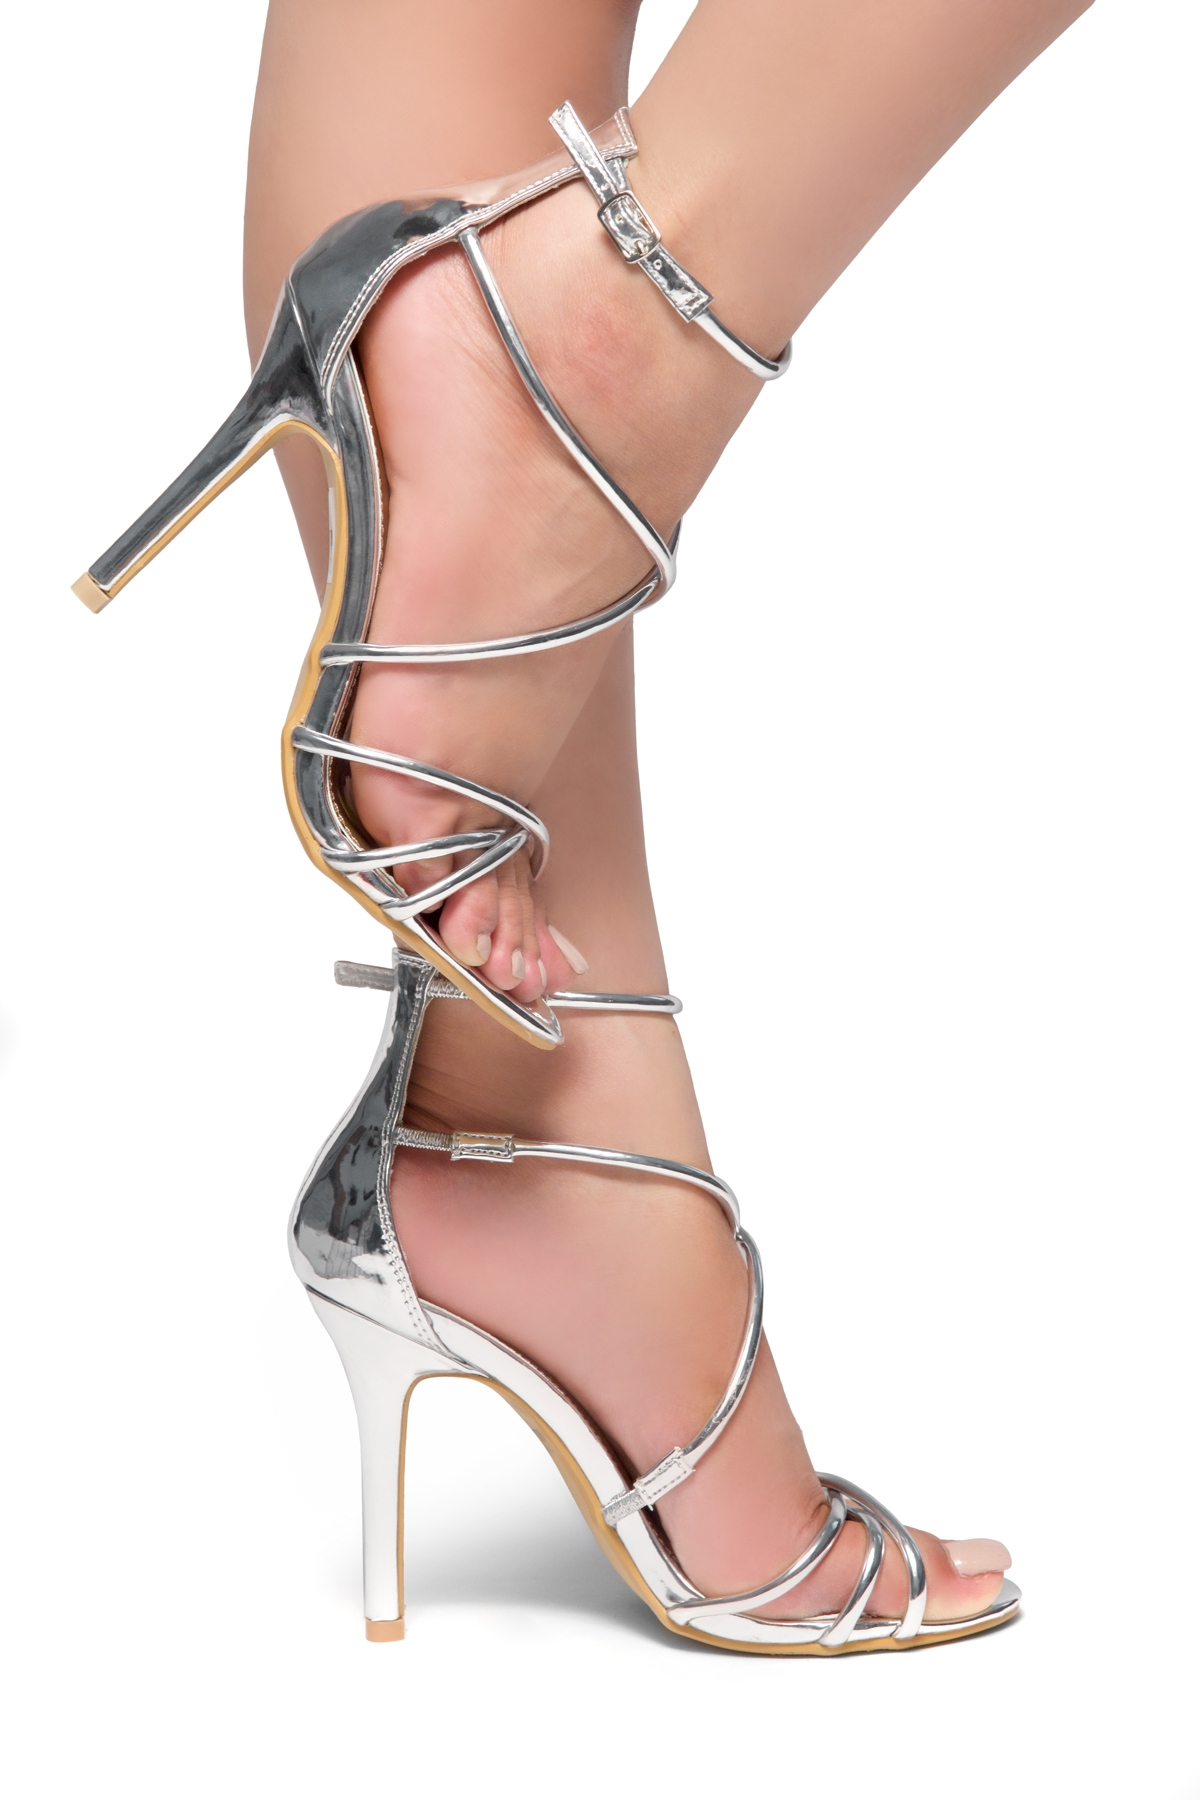 46431a9db HerStyle Villarosa-Stiletto heel